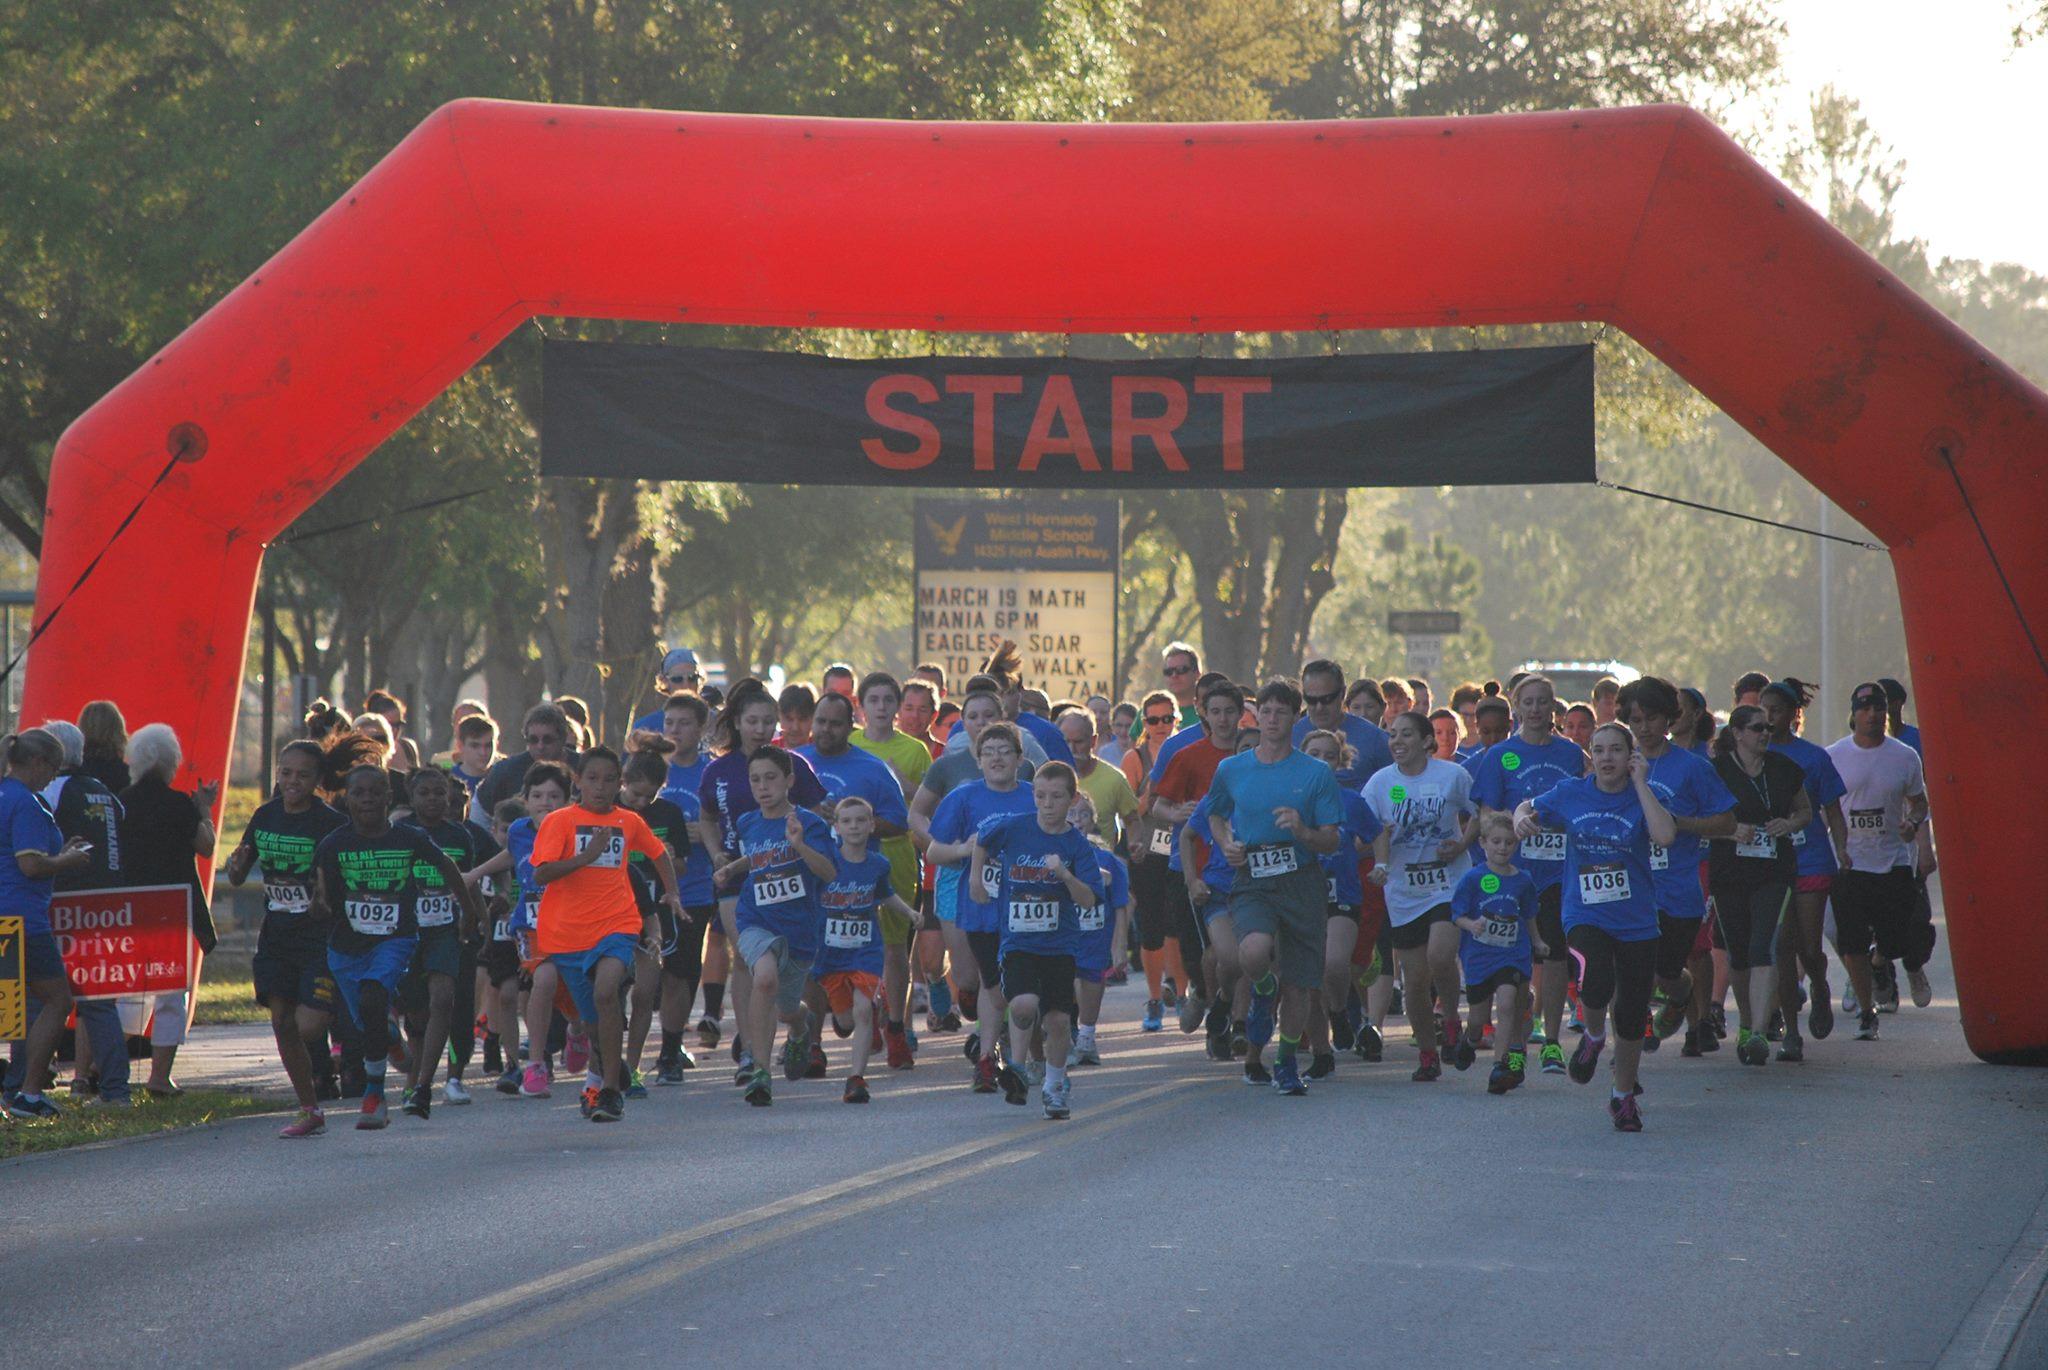 6th Annual Disability Awareness Walk & Roll 5K and Family Fun Run